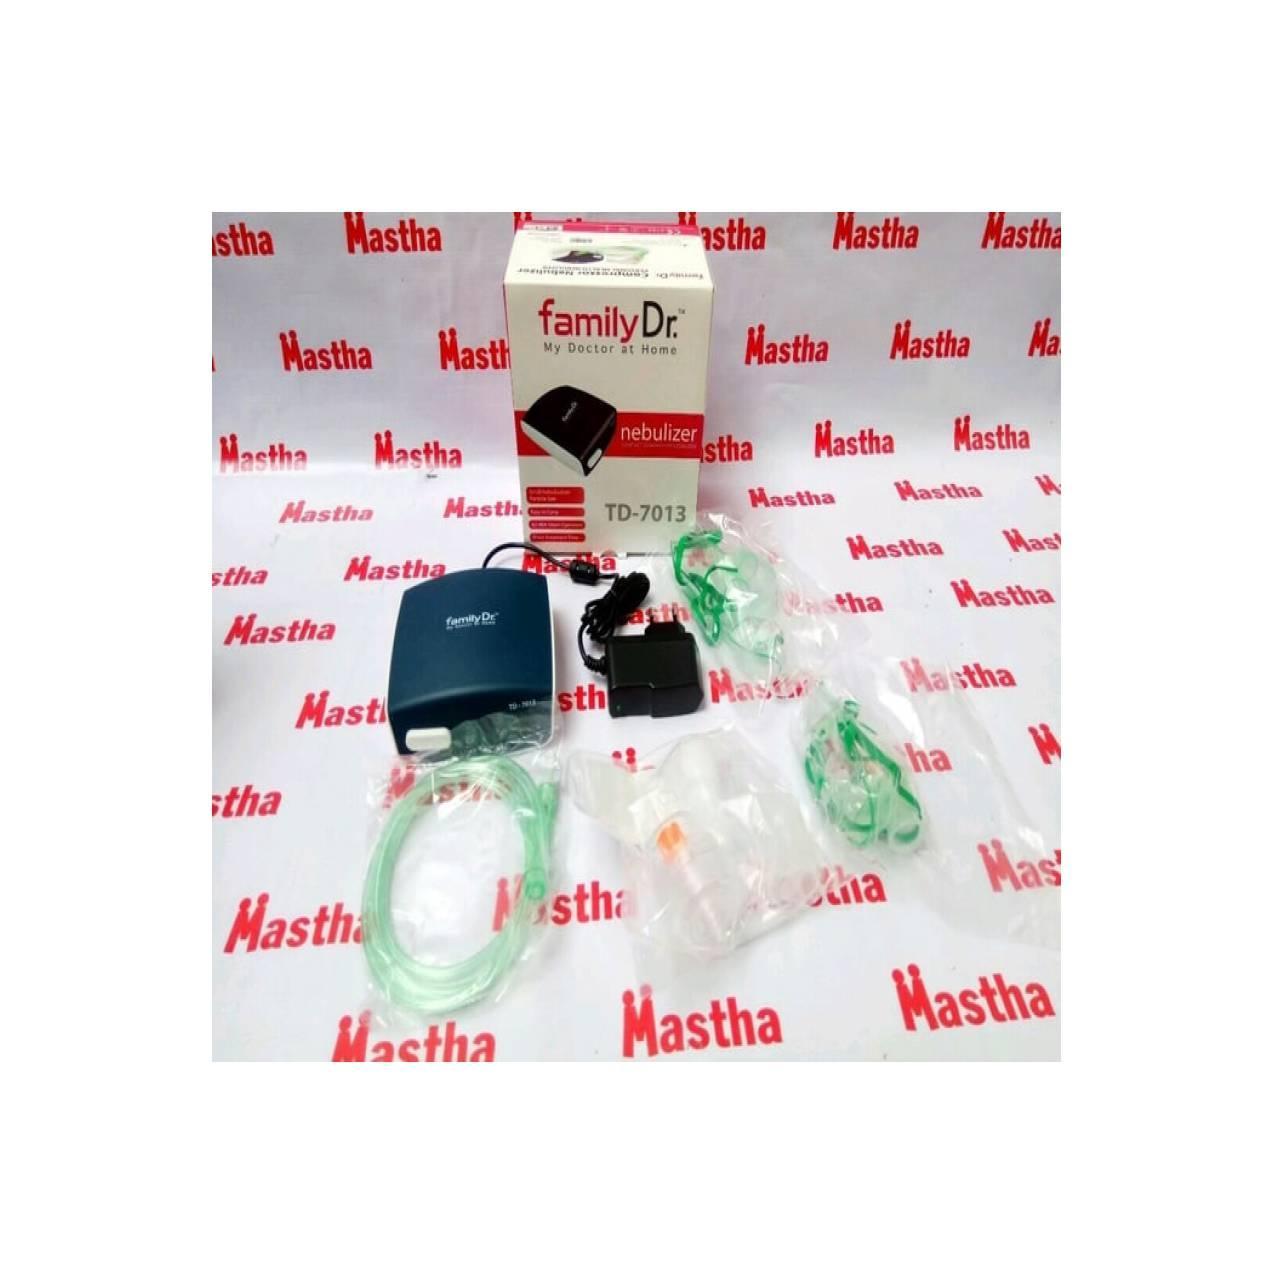 ... Harga alat bantu pernafasan uap nebulizer compressor family dr HARGALOKA COM